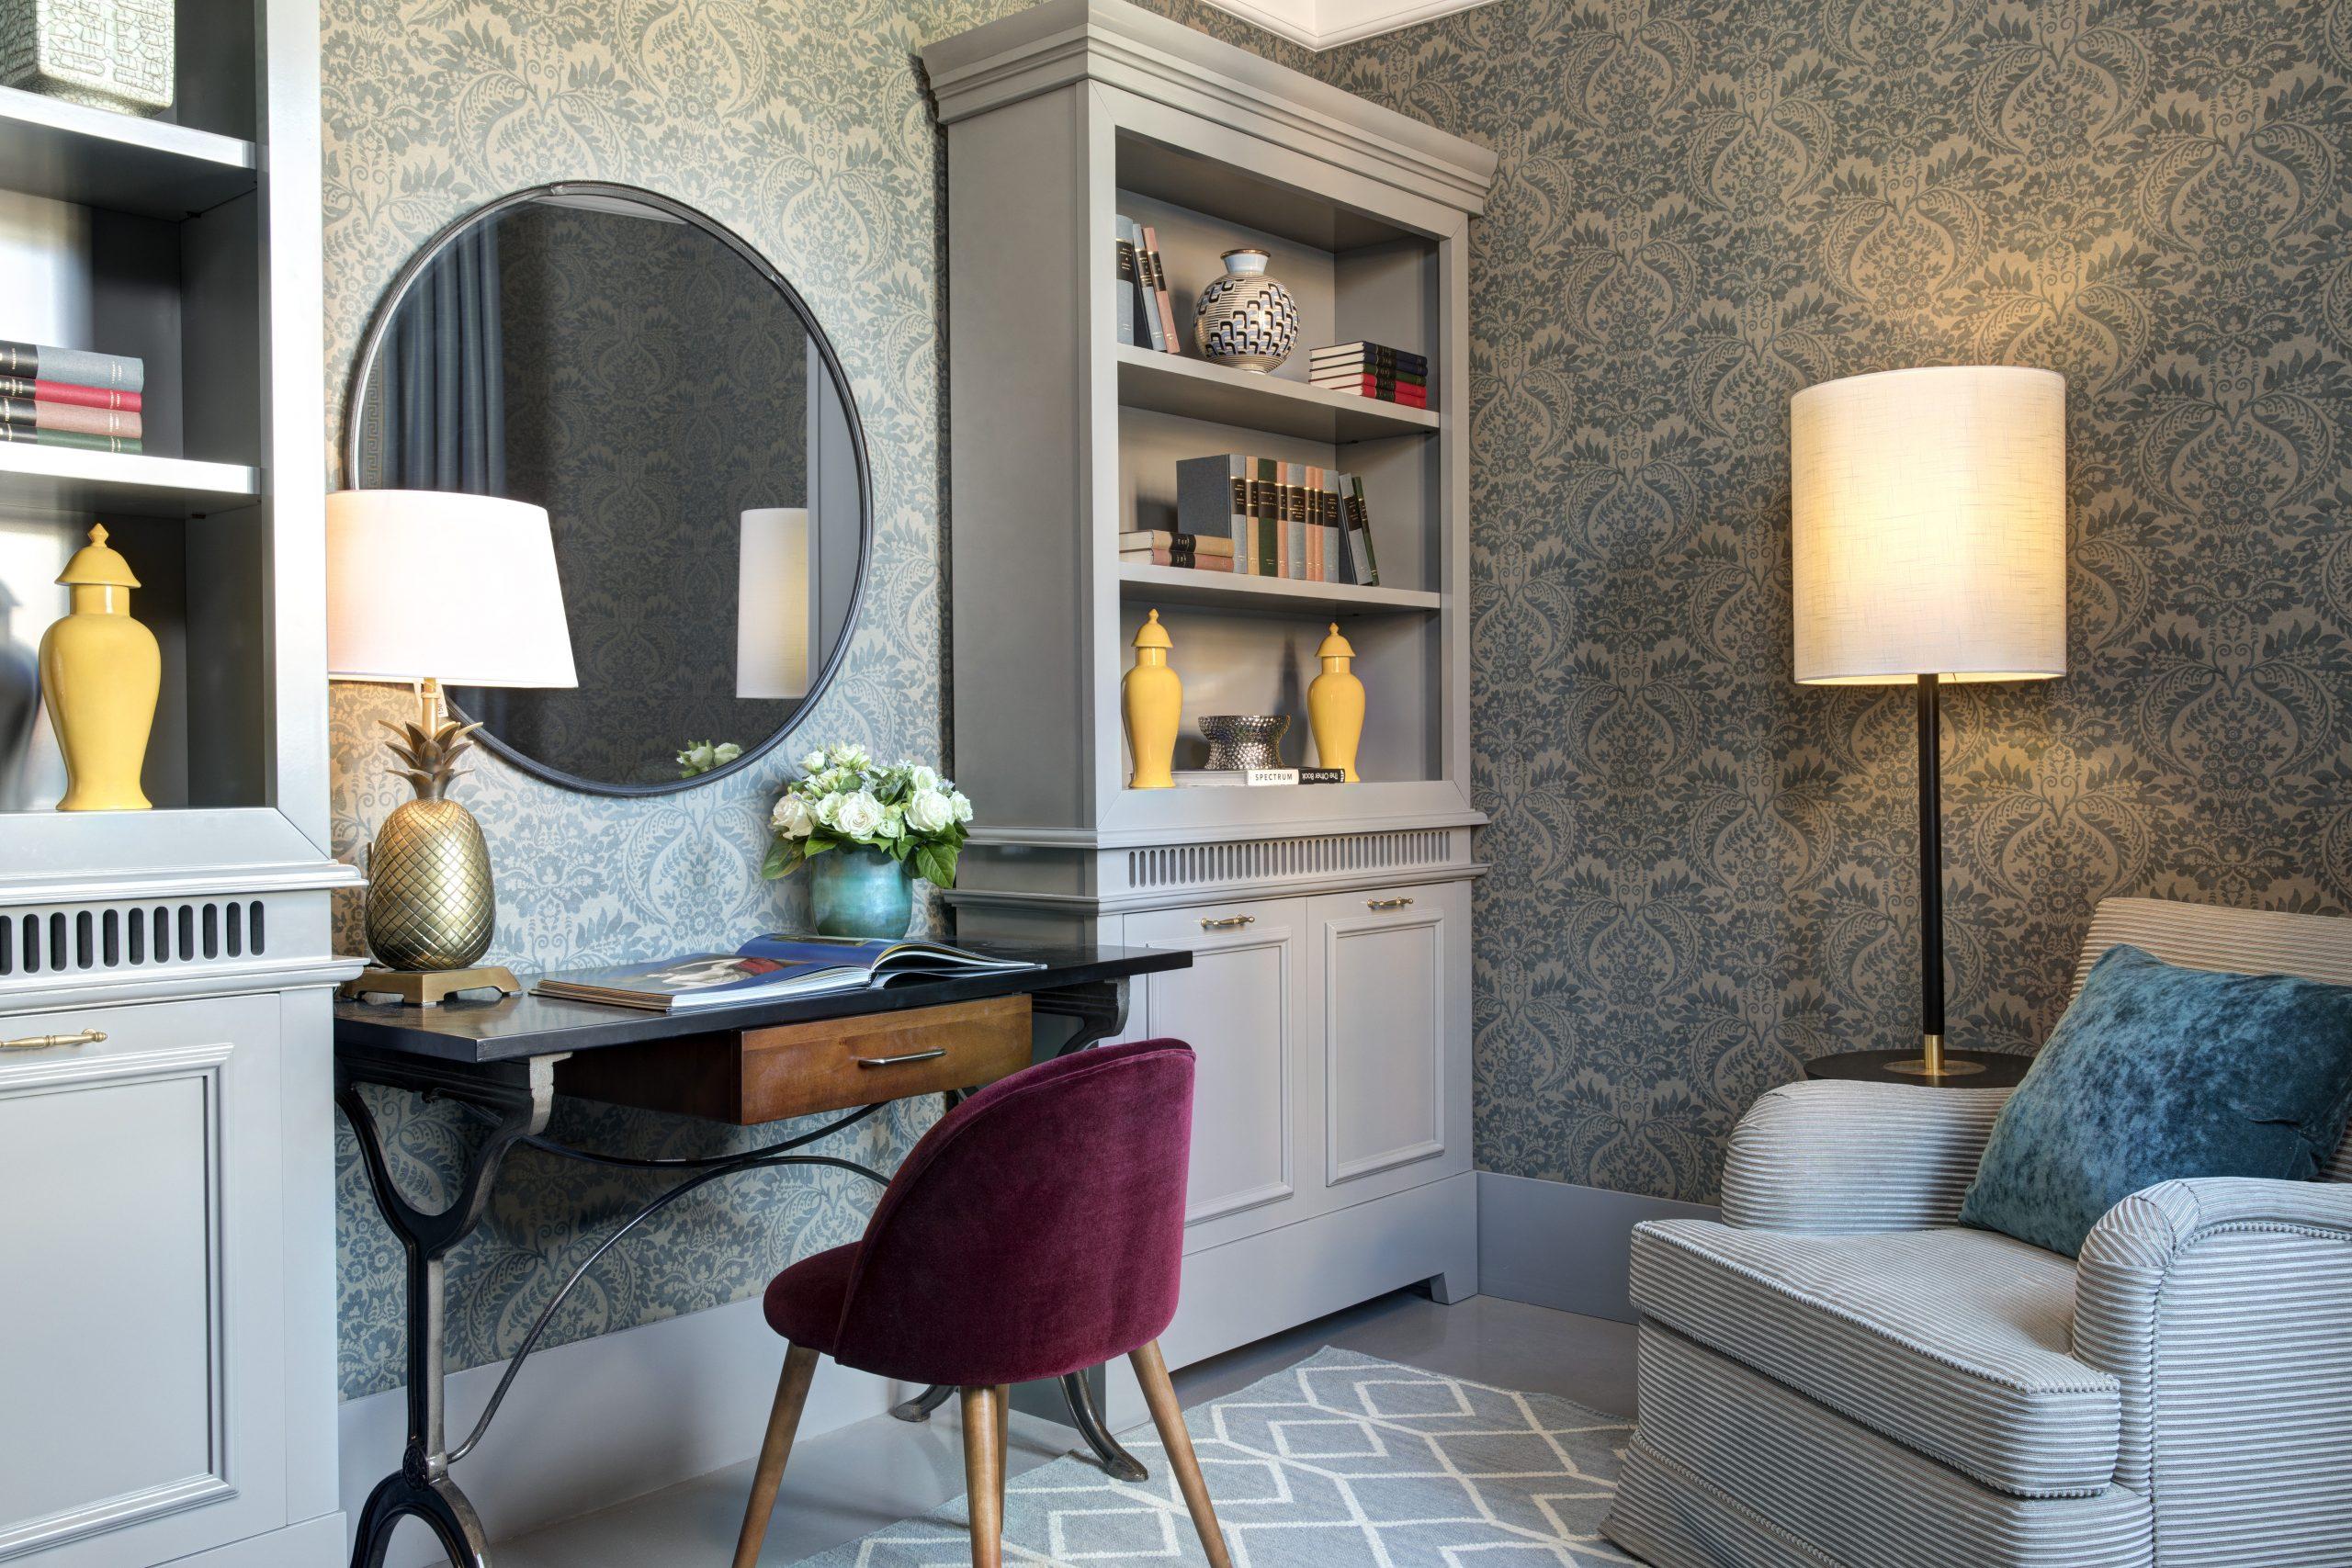 RFH Rocco Forte House - Medici Suite 0379 JG Sep 19